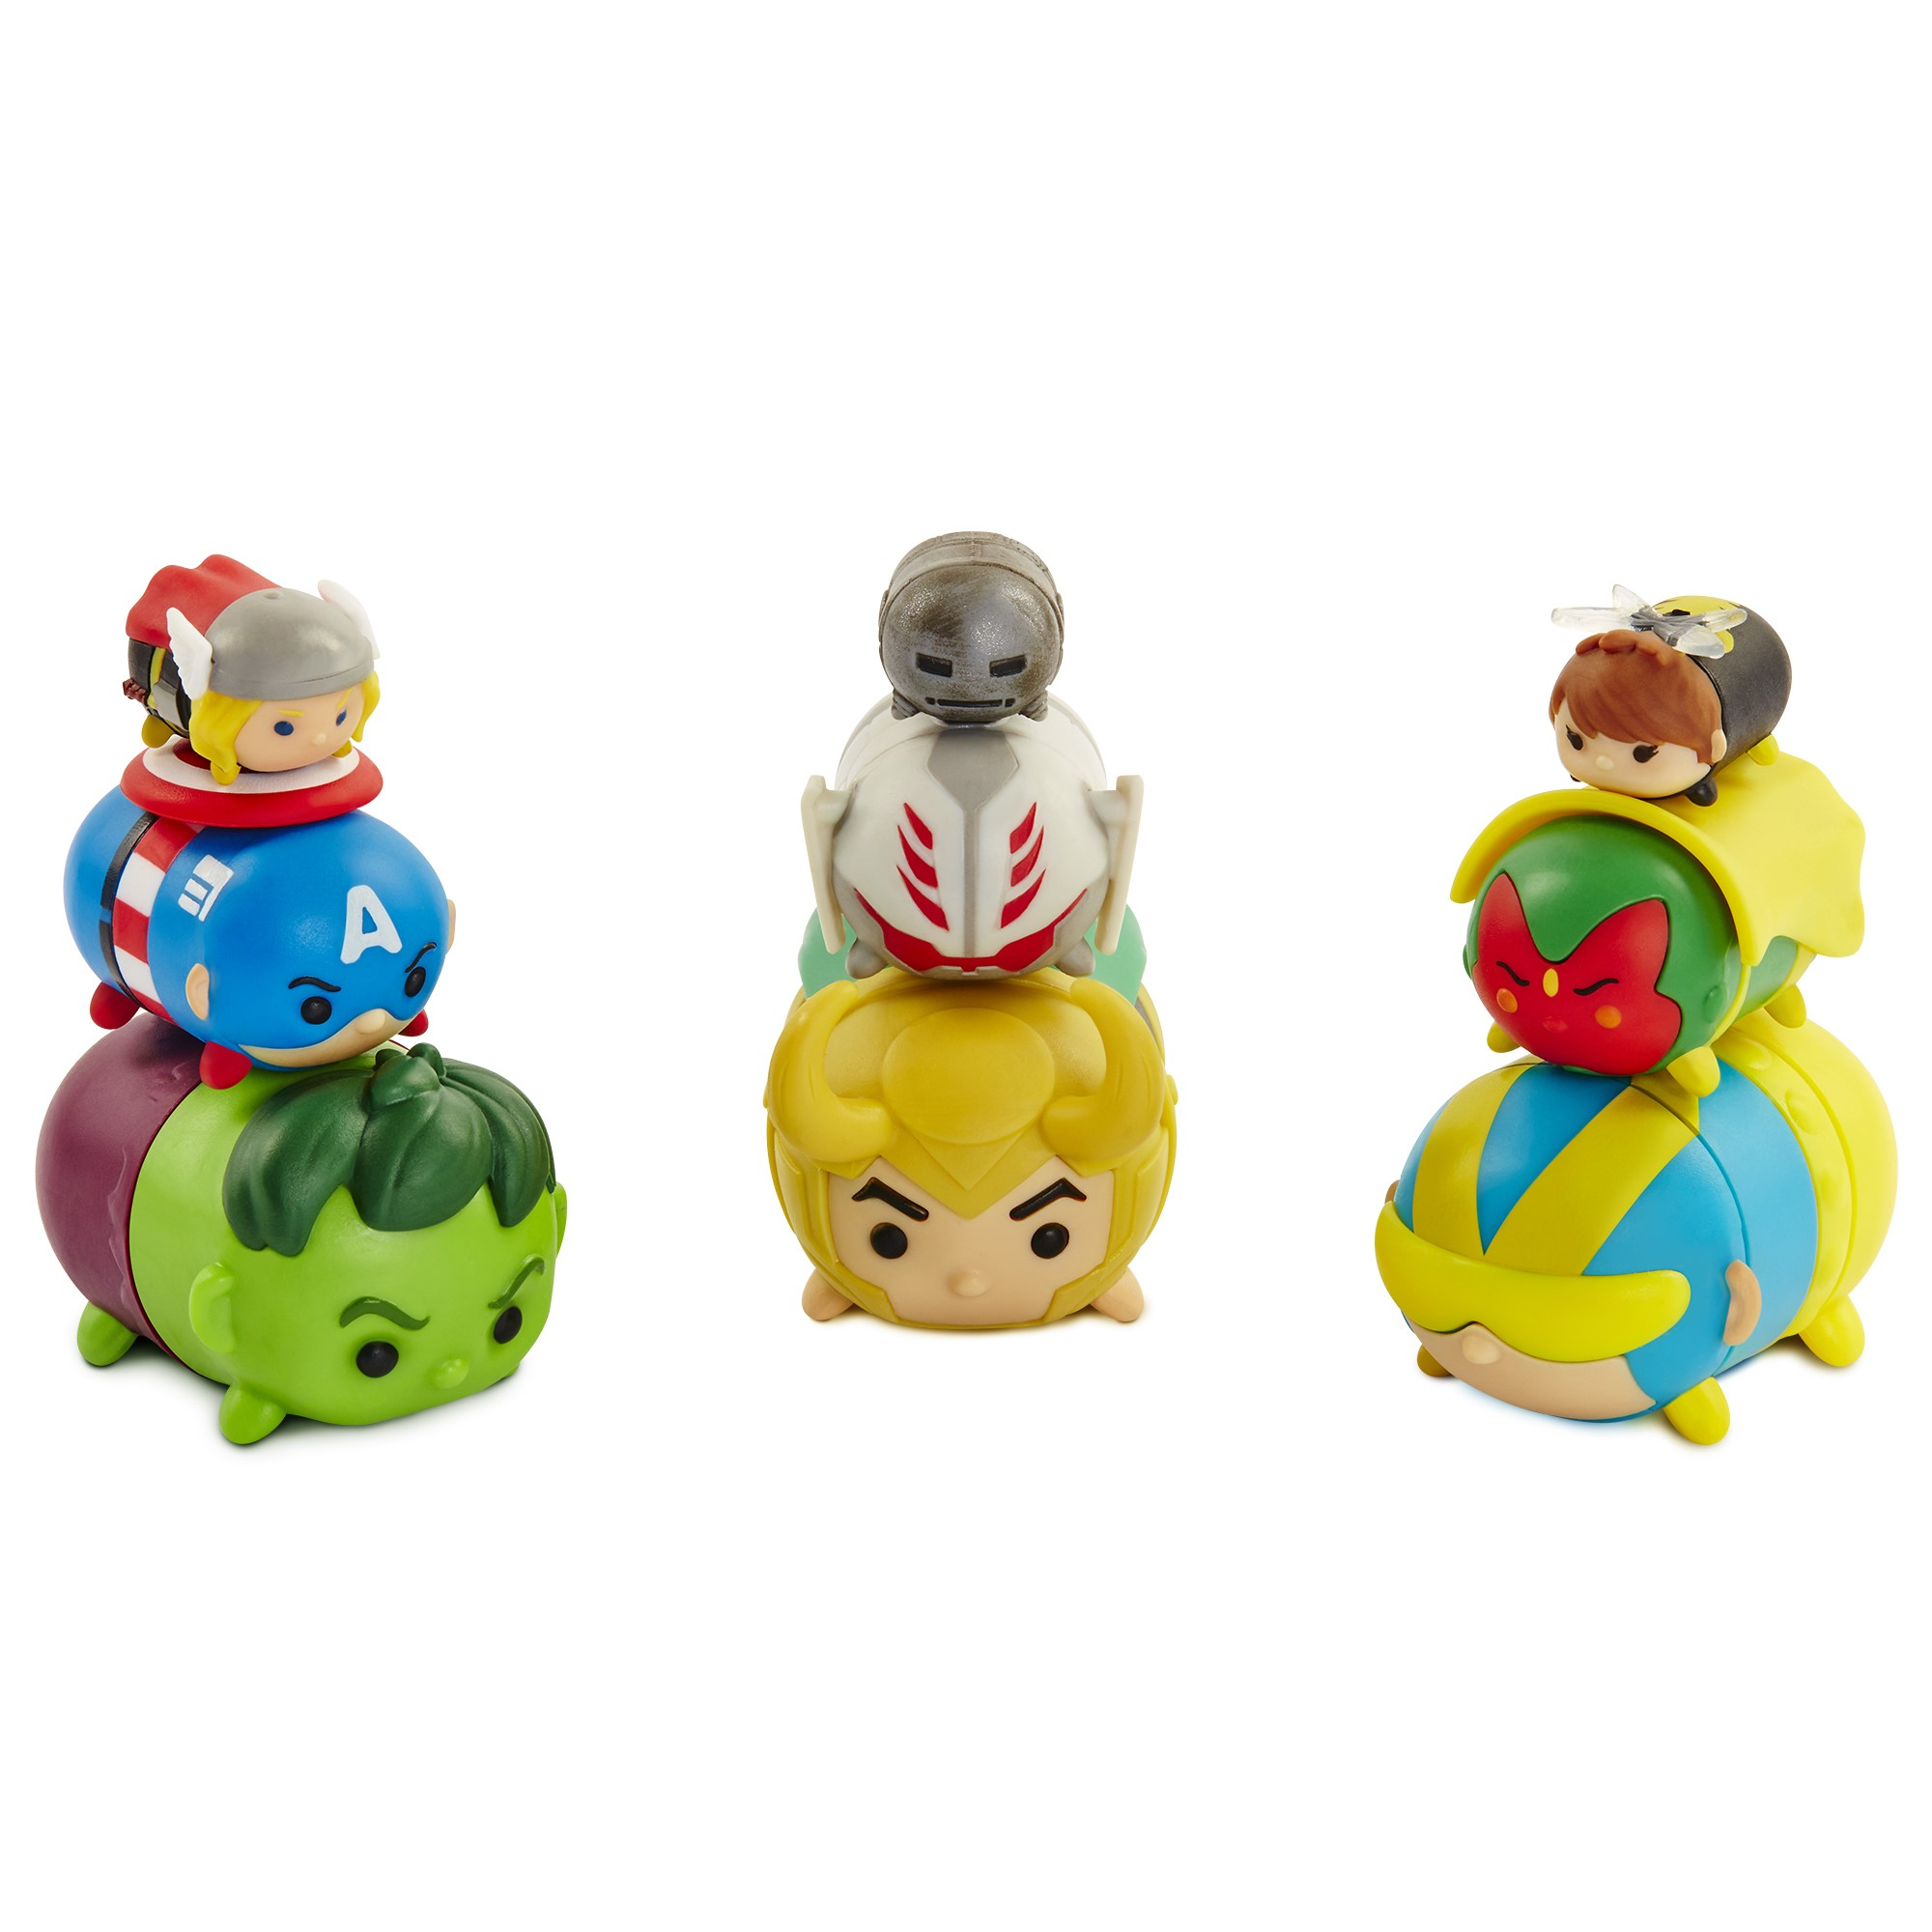 Marvel Tsum Tsum 9-Pack Figures - Giant Man, Loki, Hulk, Vision, Captain America, Ultron, Thor, Wasp & Iron Mark